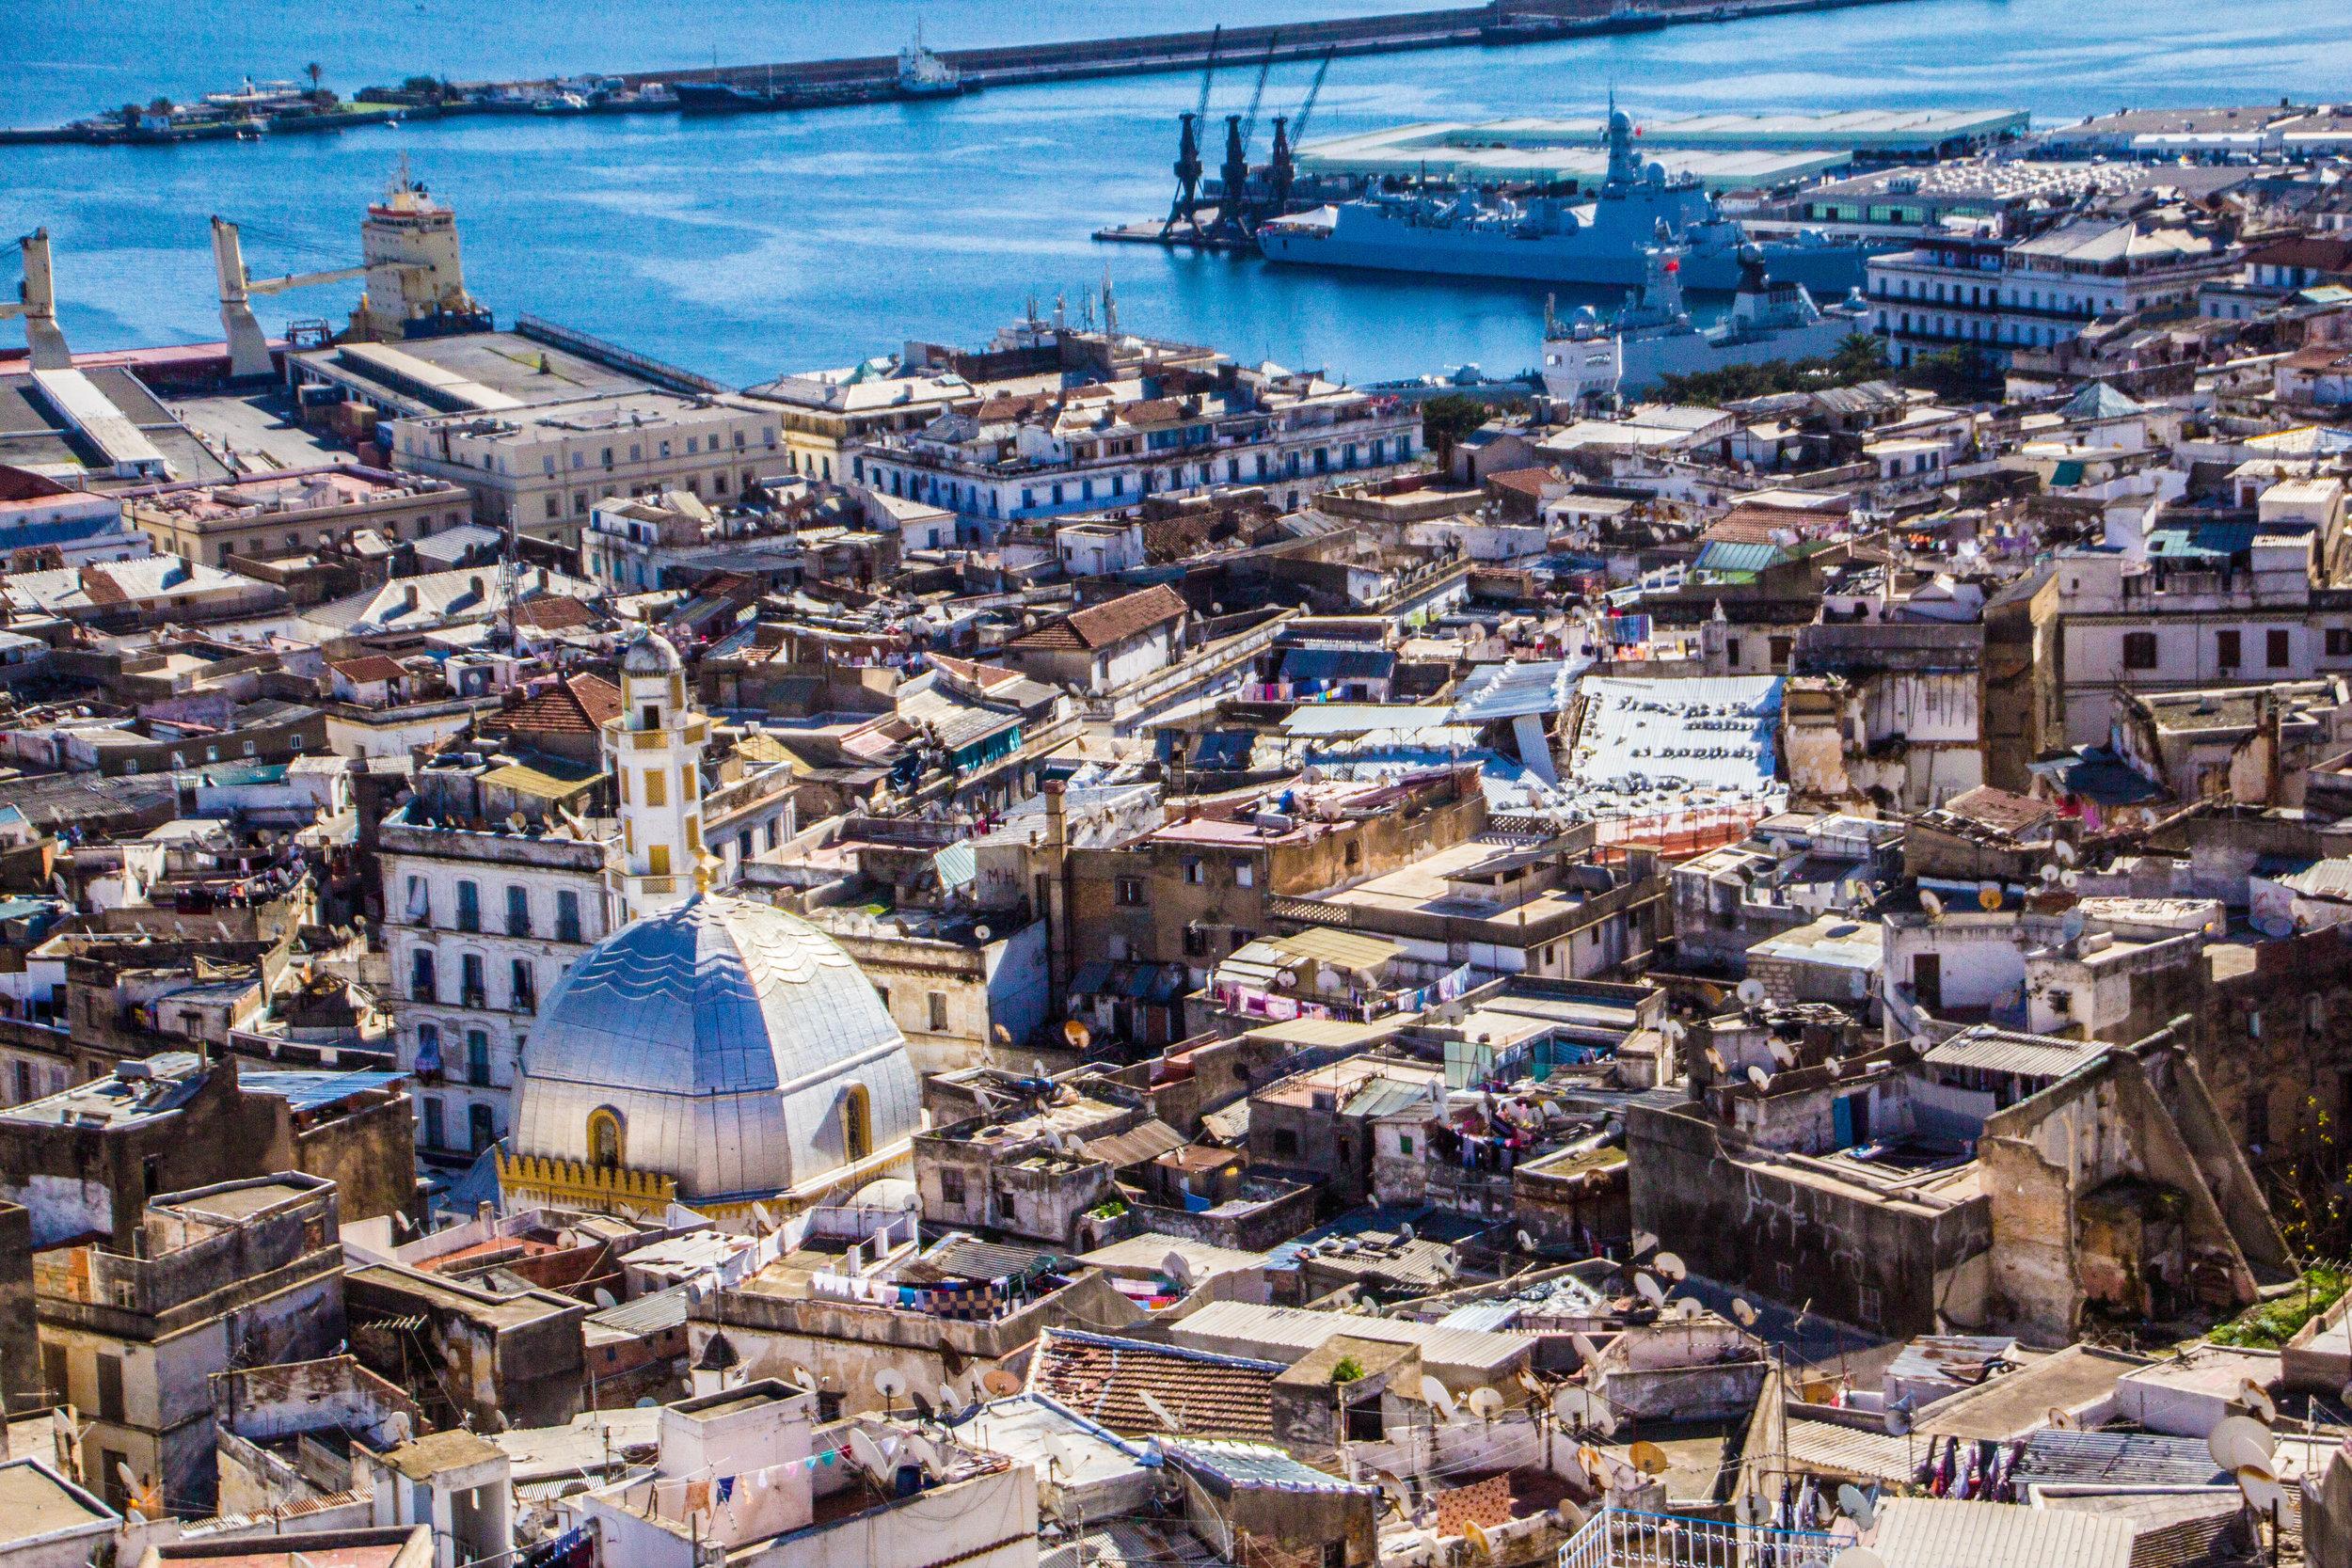 casbah-from-above-algiers-algeria-14.jpg